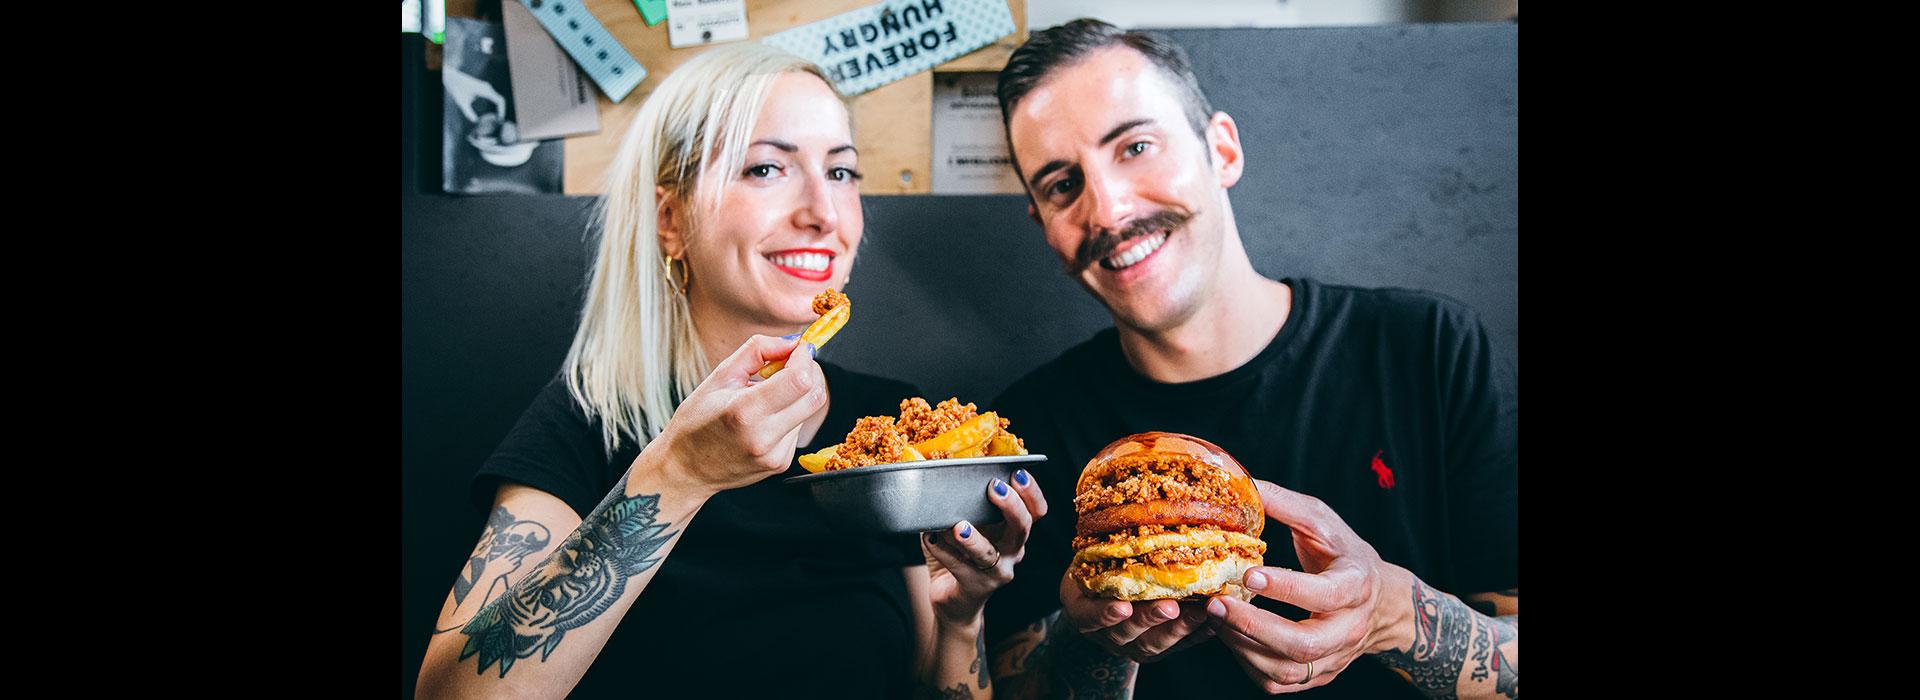 laura-e-geremia_bonelli-burger_i-migliori-hamburger-d'italia_desktop